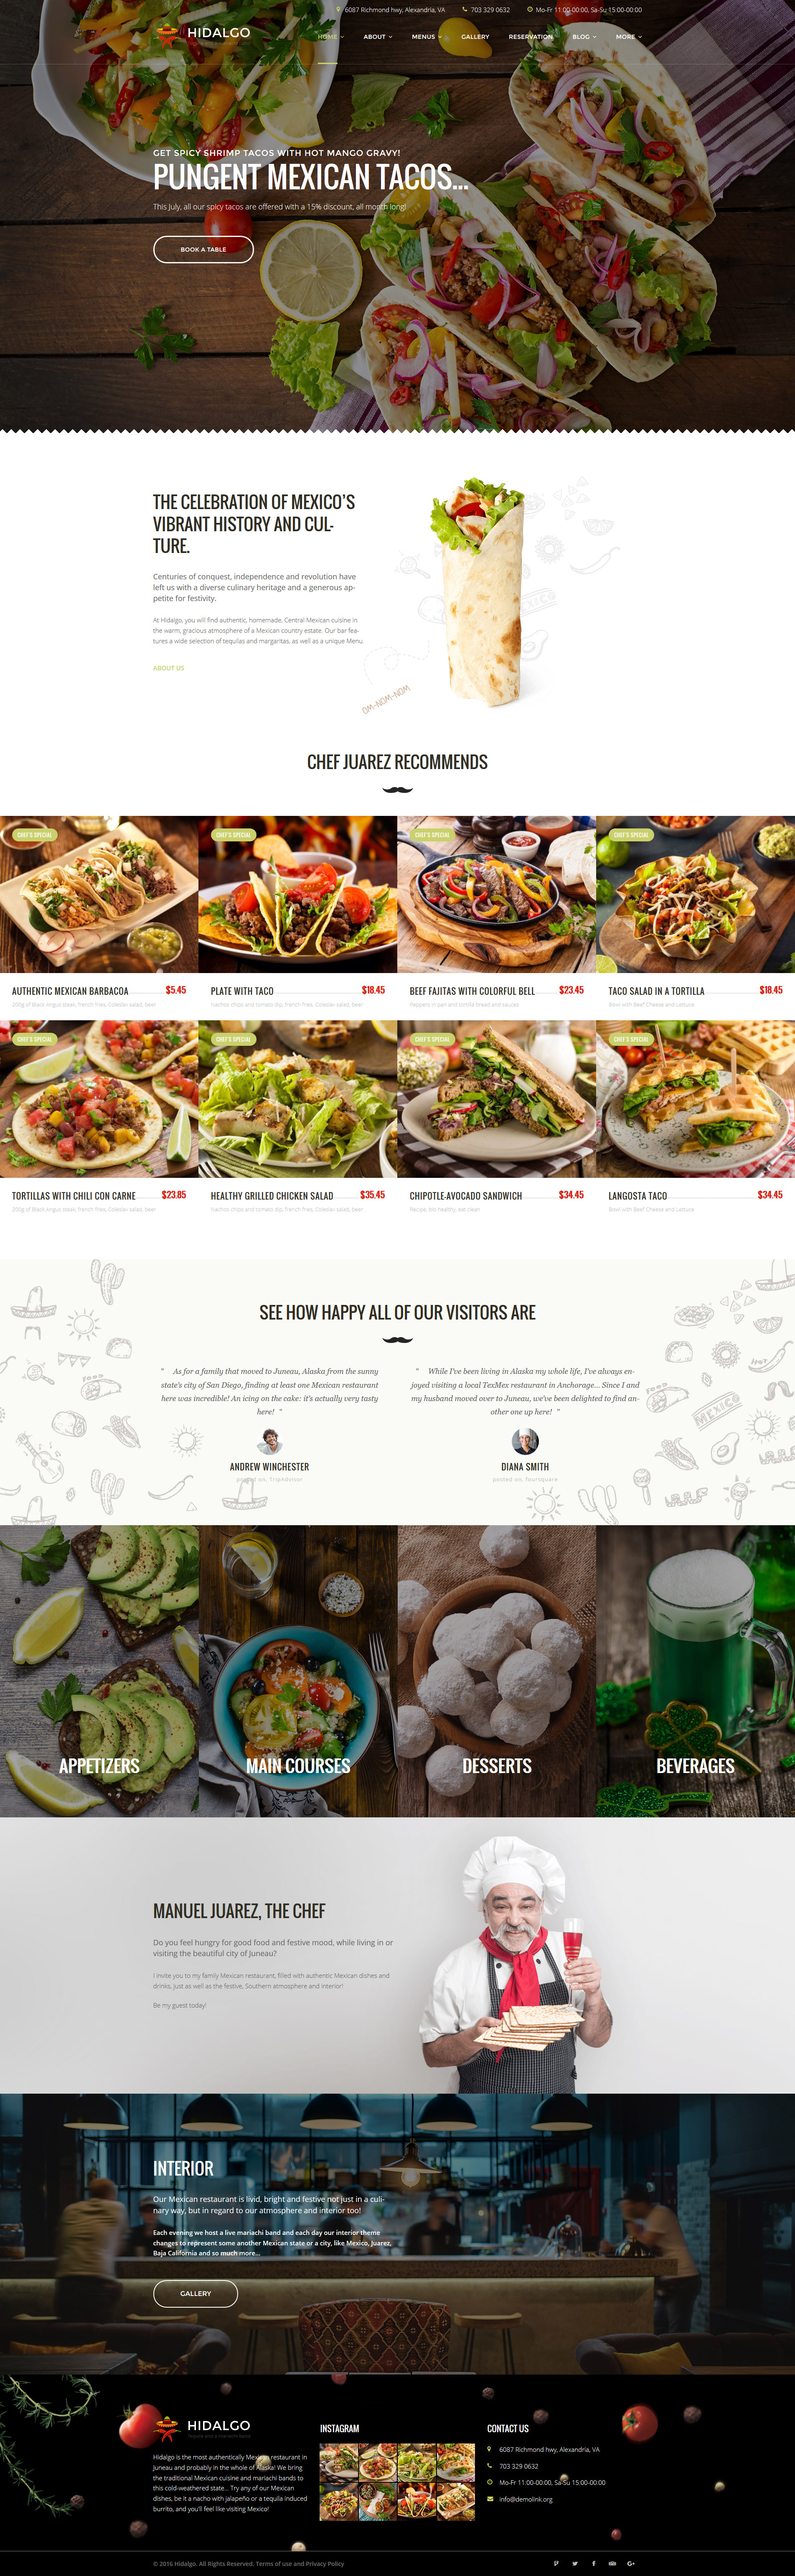 Reszponzív Hidalgo - Mexican Food Restaurant WordPress sablon 59006